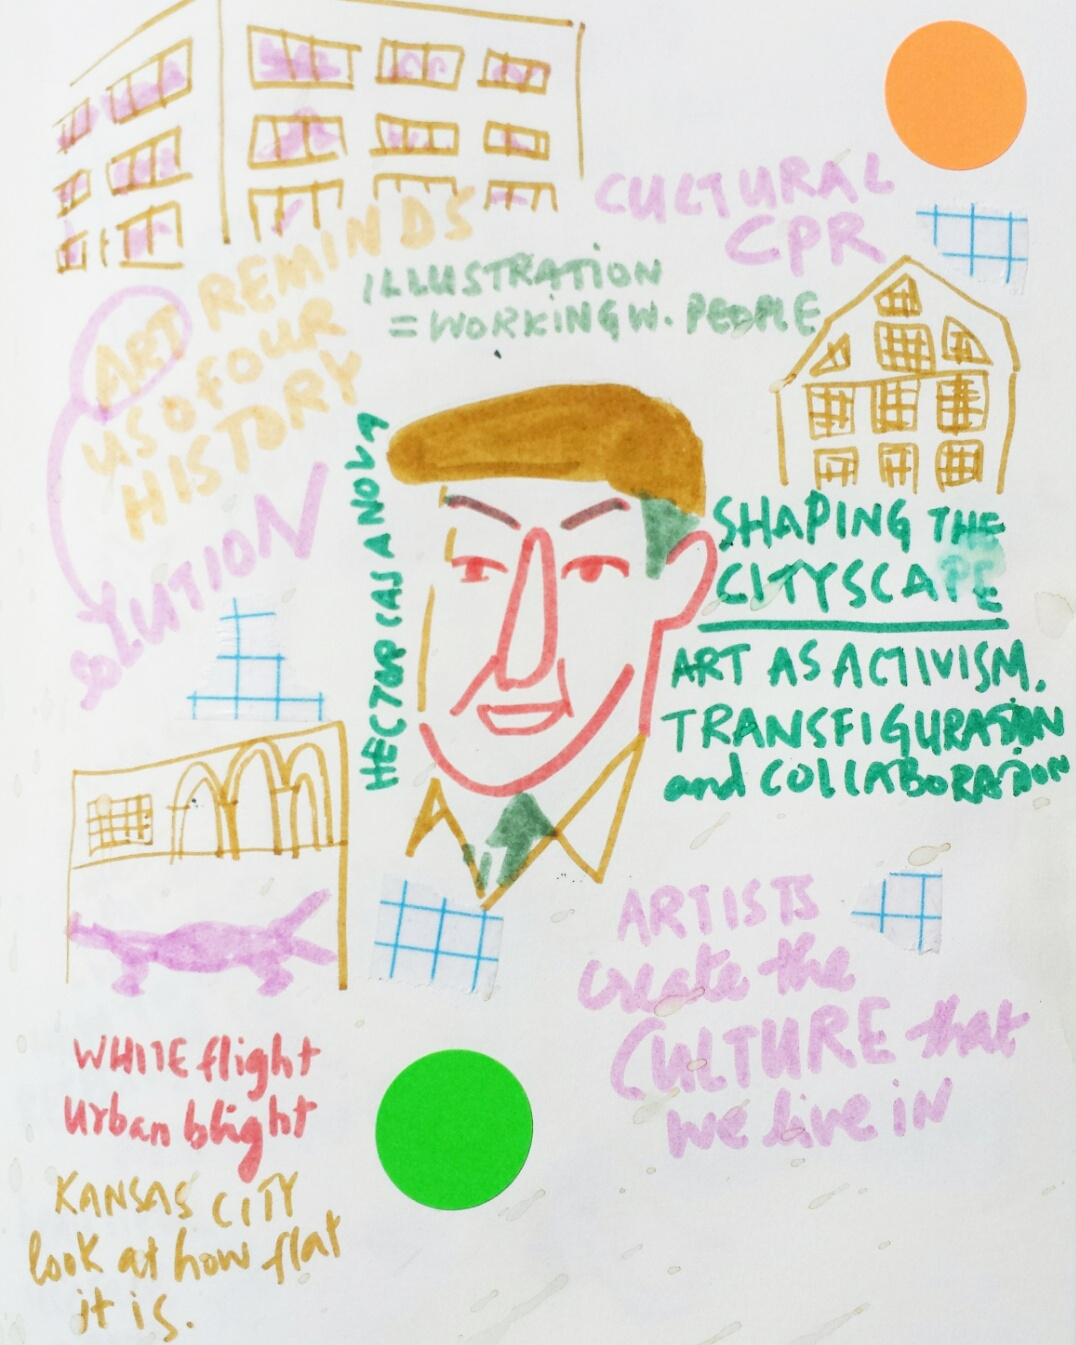 Hector Casanova / Shaping the Cityscape: Art as Transfiguration & COllaboration